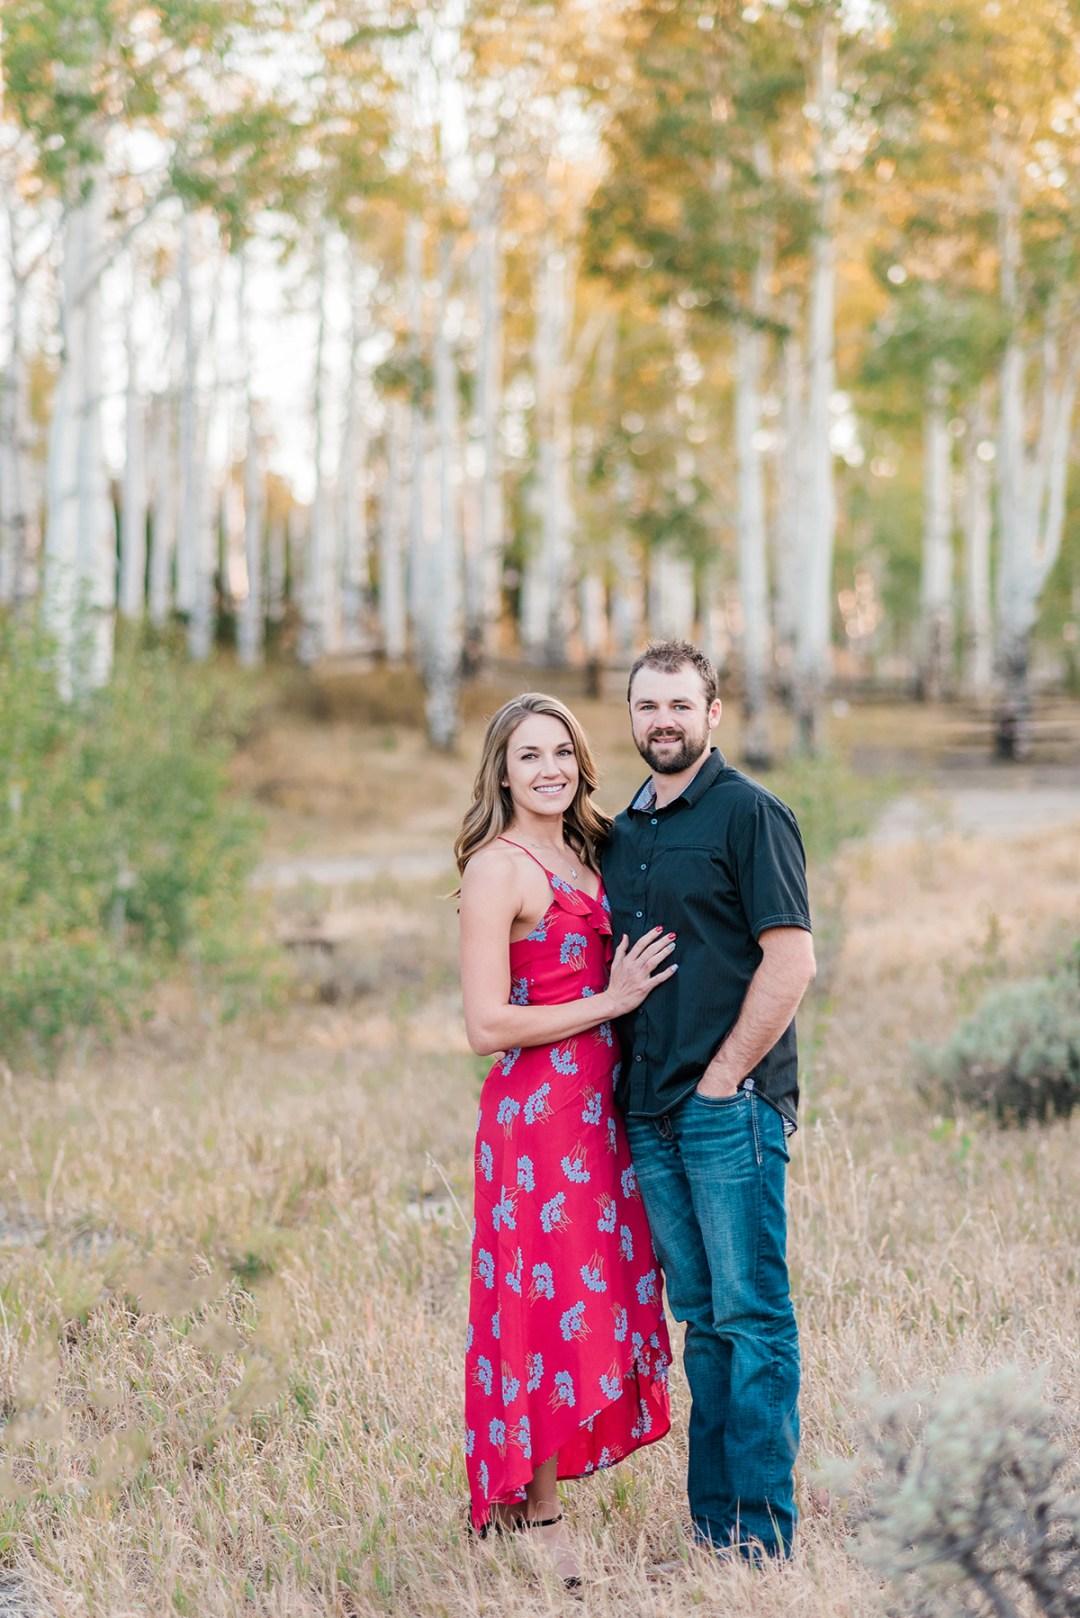 Garrett & Jennis | Fall Engagement Photos on Glade Park